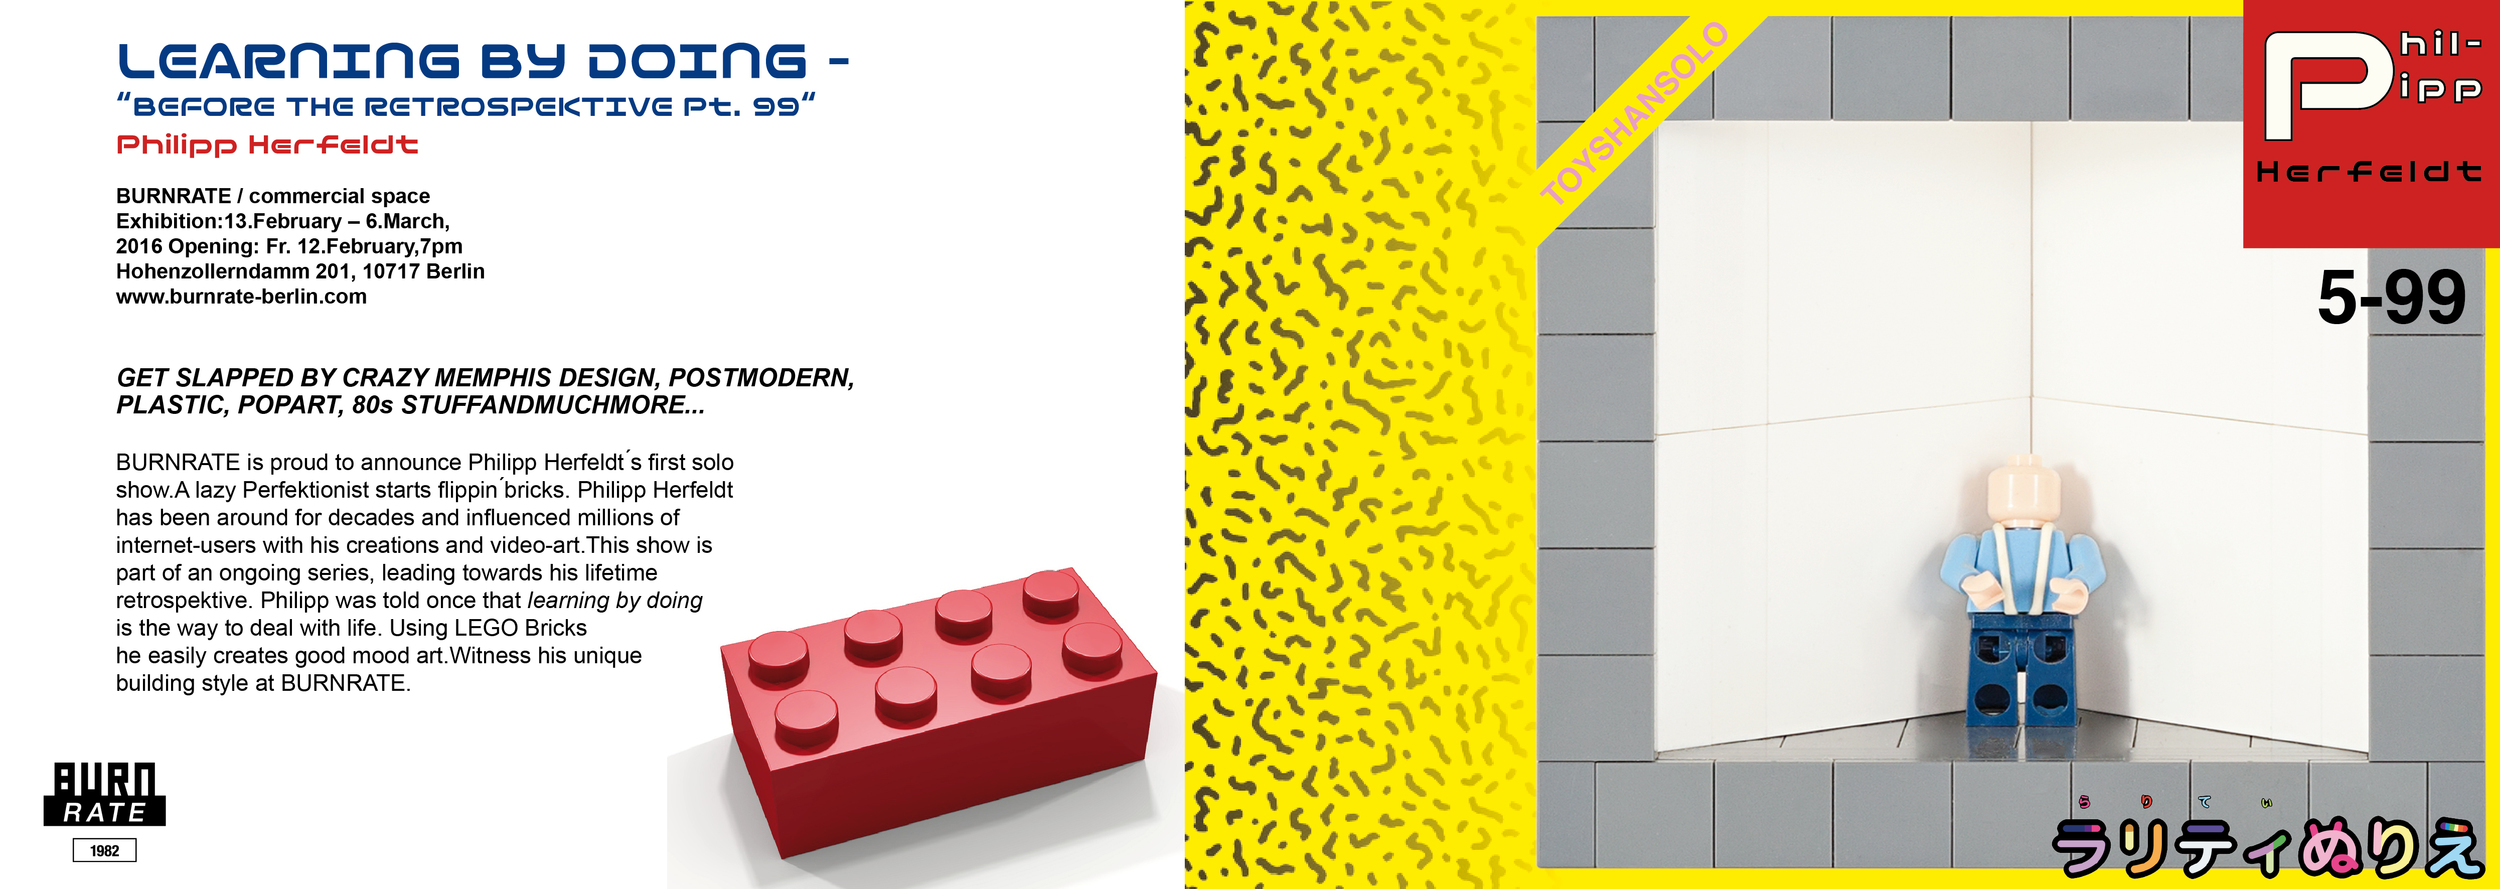 Lego BROSCHURE.jpg